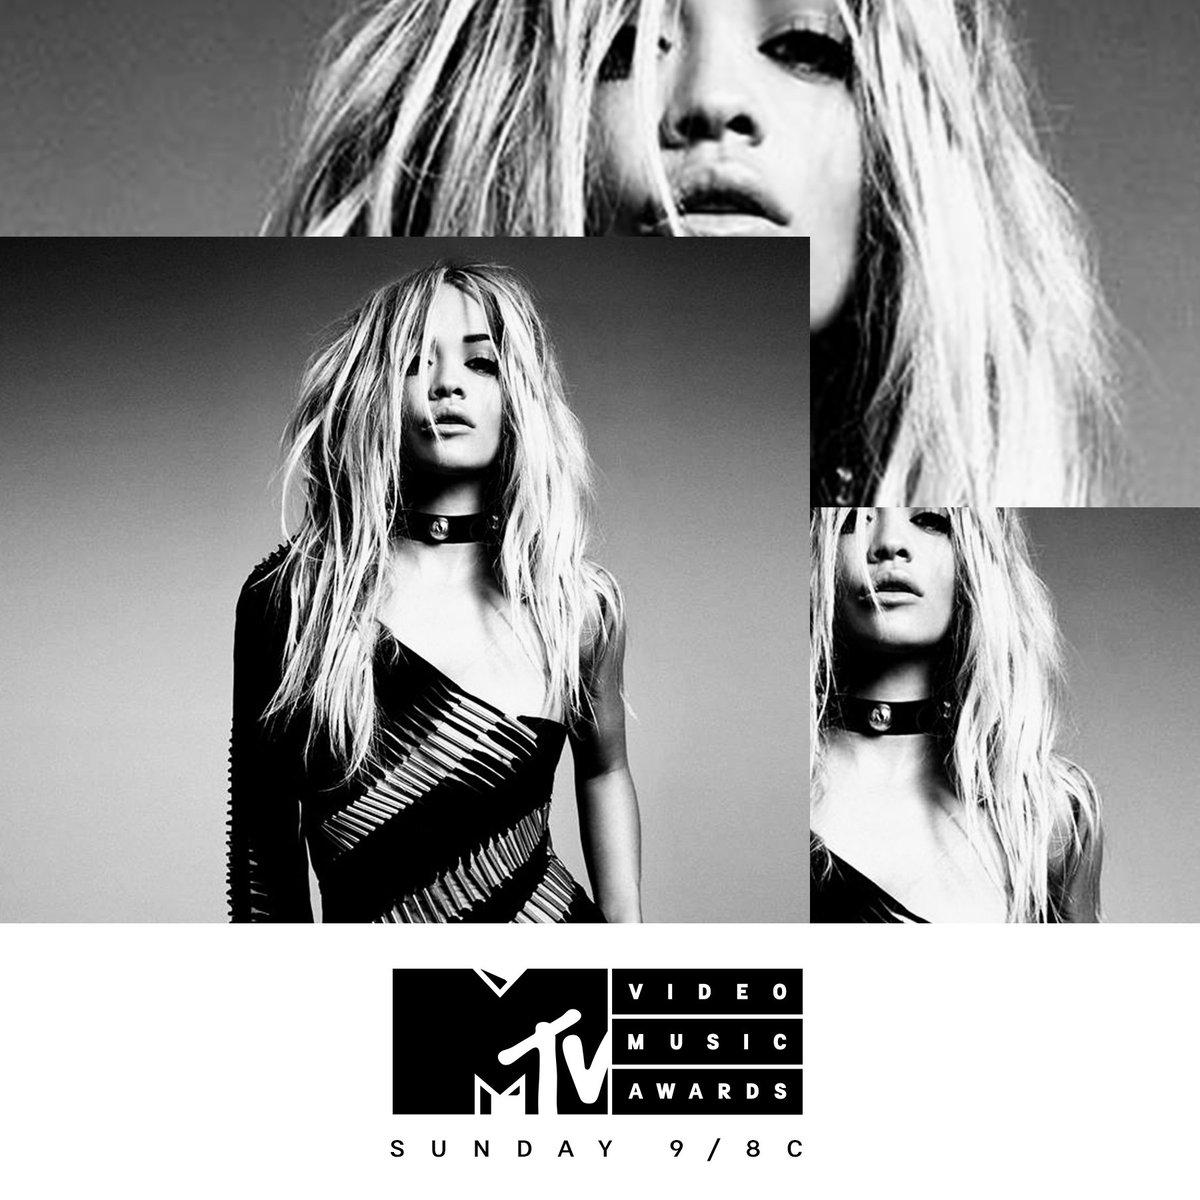 #VMAs see you Sunday!! ???????????????????????????????????????????????????????? @MTV https://t.co/m4H9GFtxM6